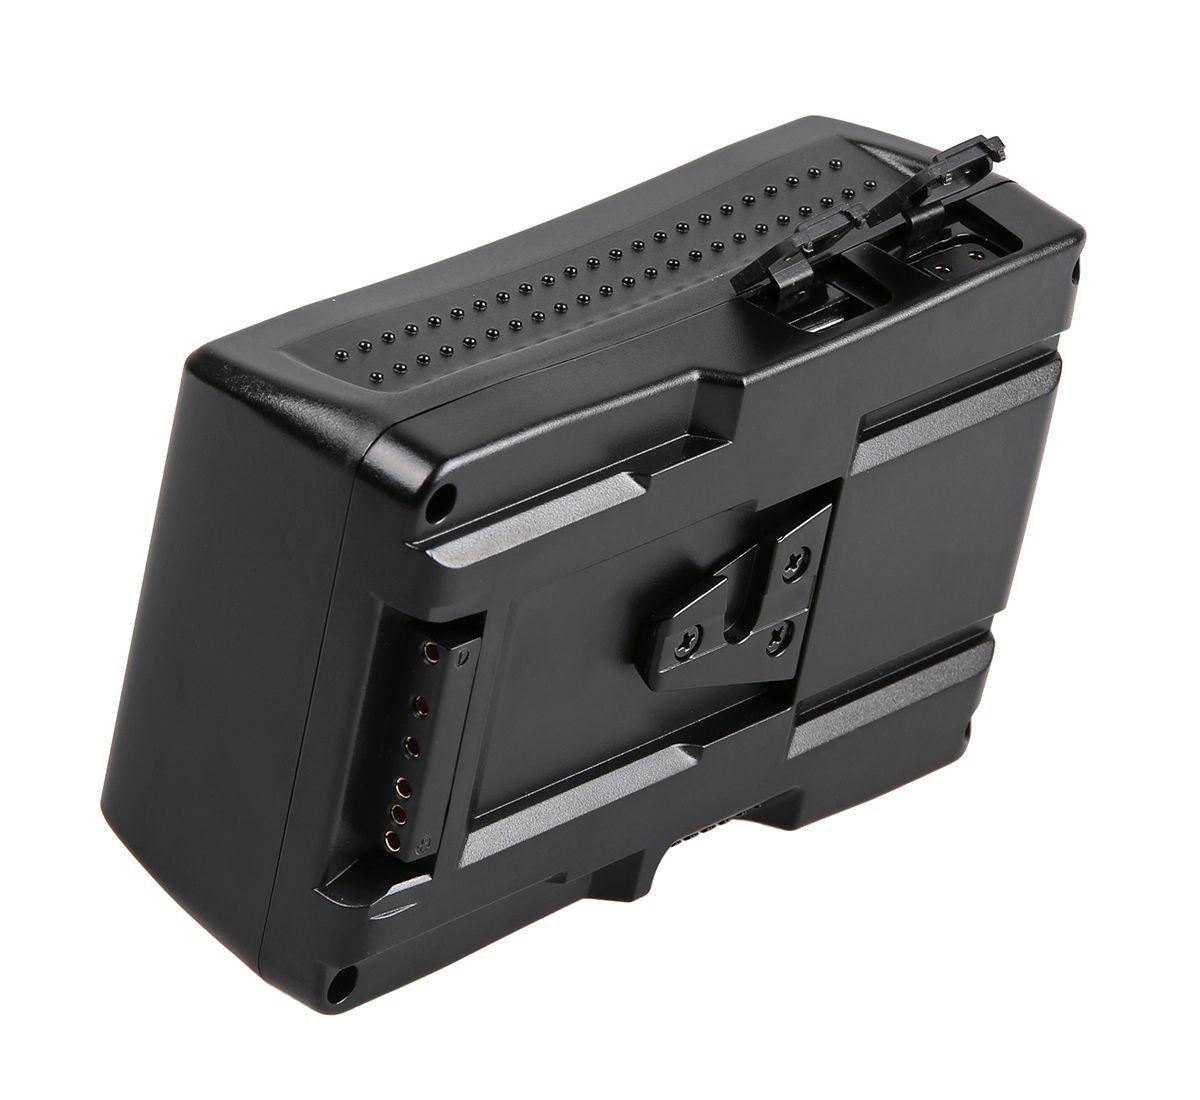 Bateria BP-190WS 13200MAH para Sony